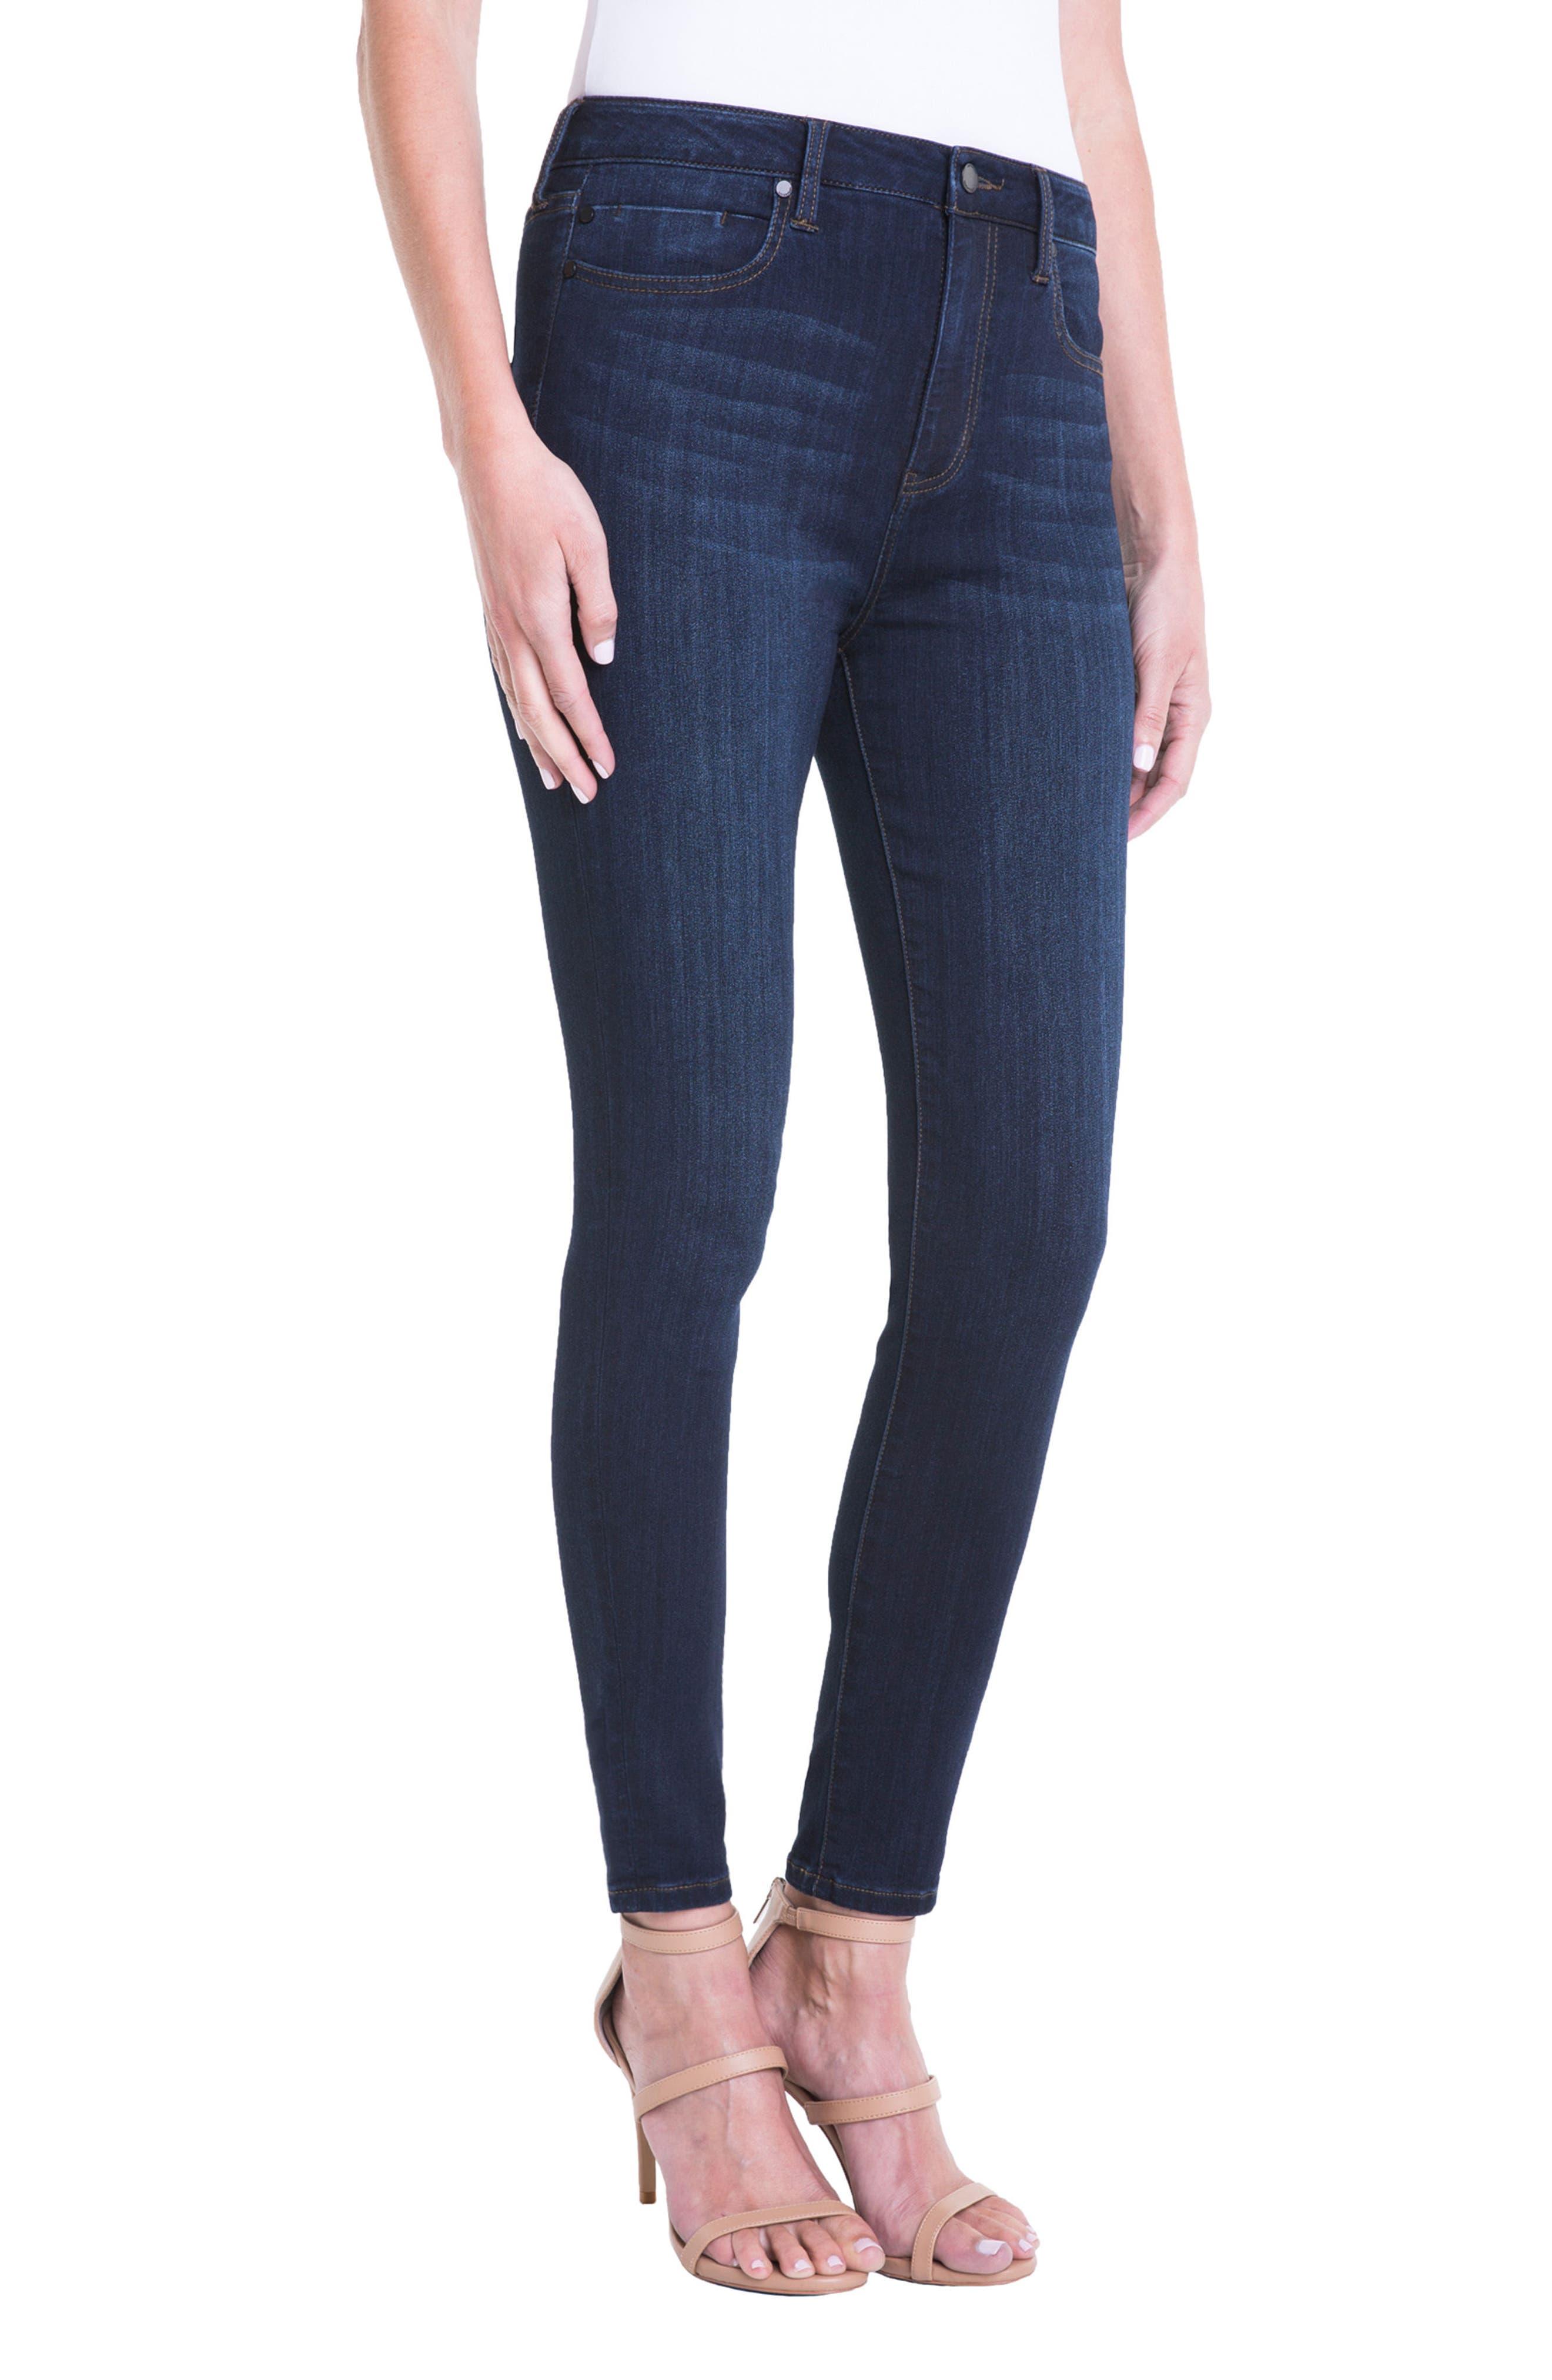 Jeans Company Bridget High Waist Skinny Jeans,                             Alternate thumbnail 3, color,                             Dunmore Dark